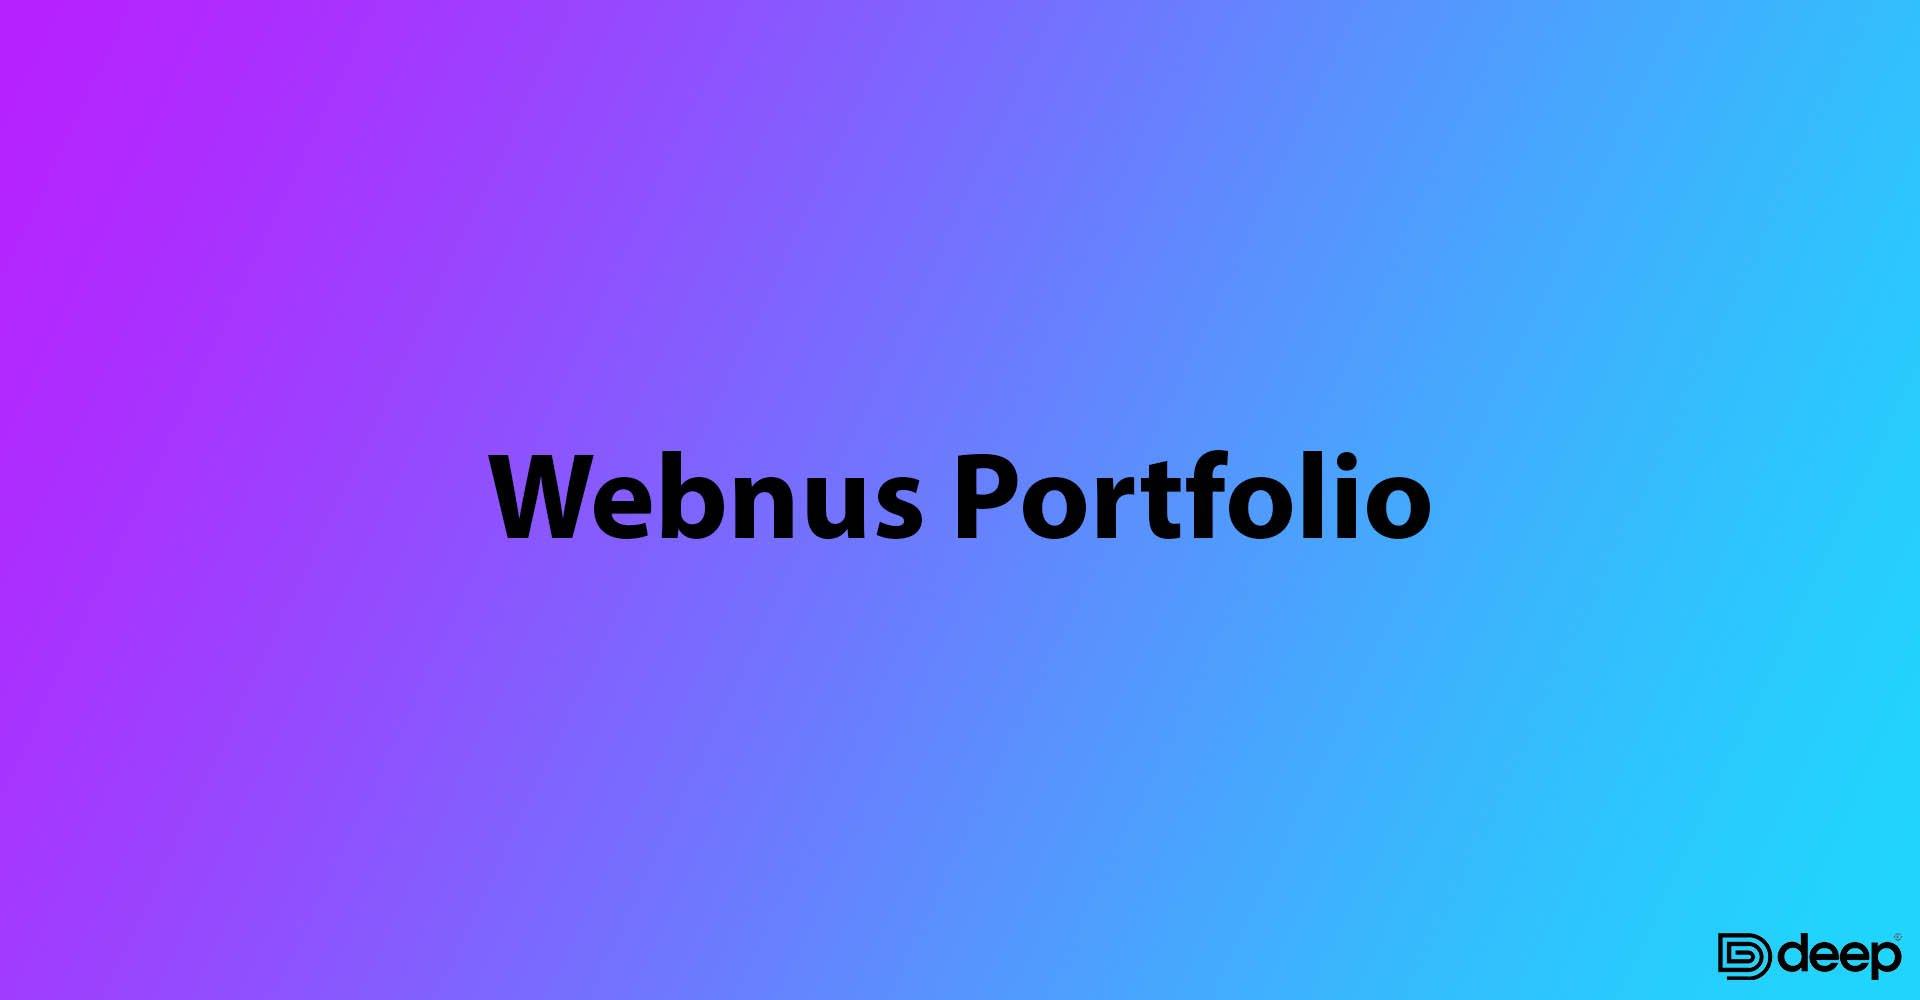 Webnus Portfolio